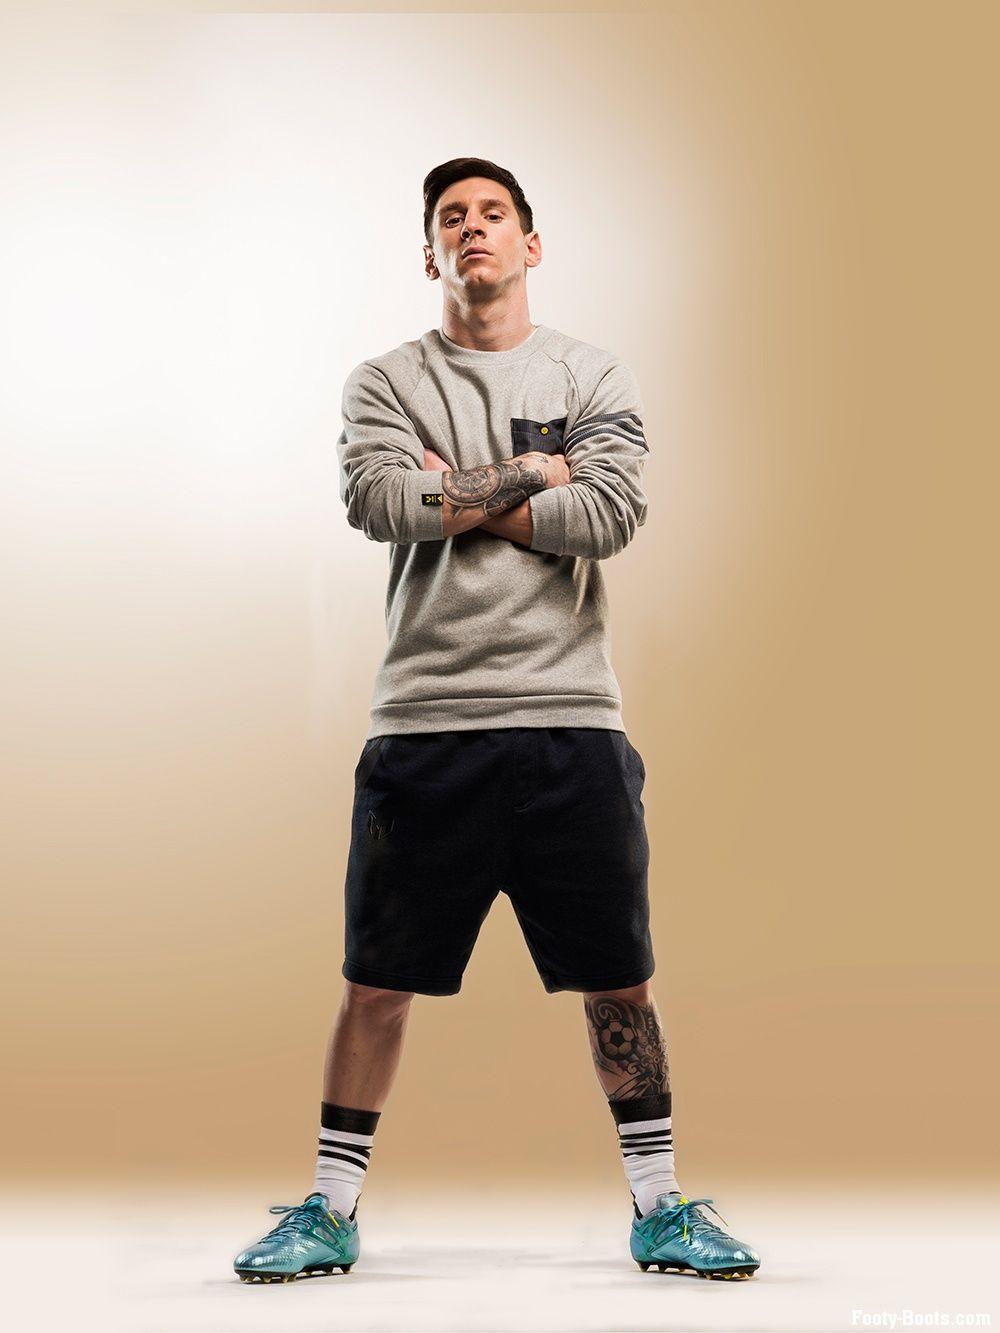 Adidas Messi15 Football Boots Lionel Messi Messi Leo Messi